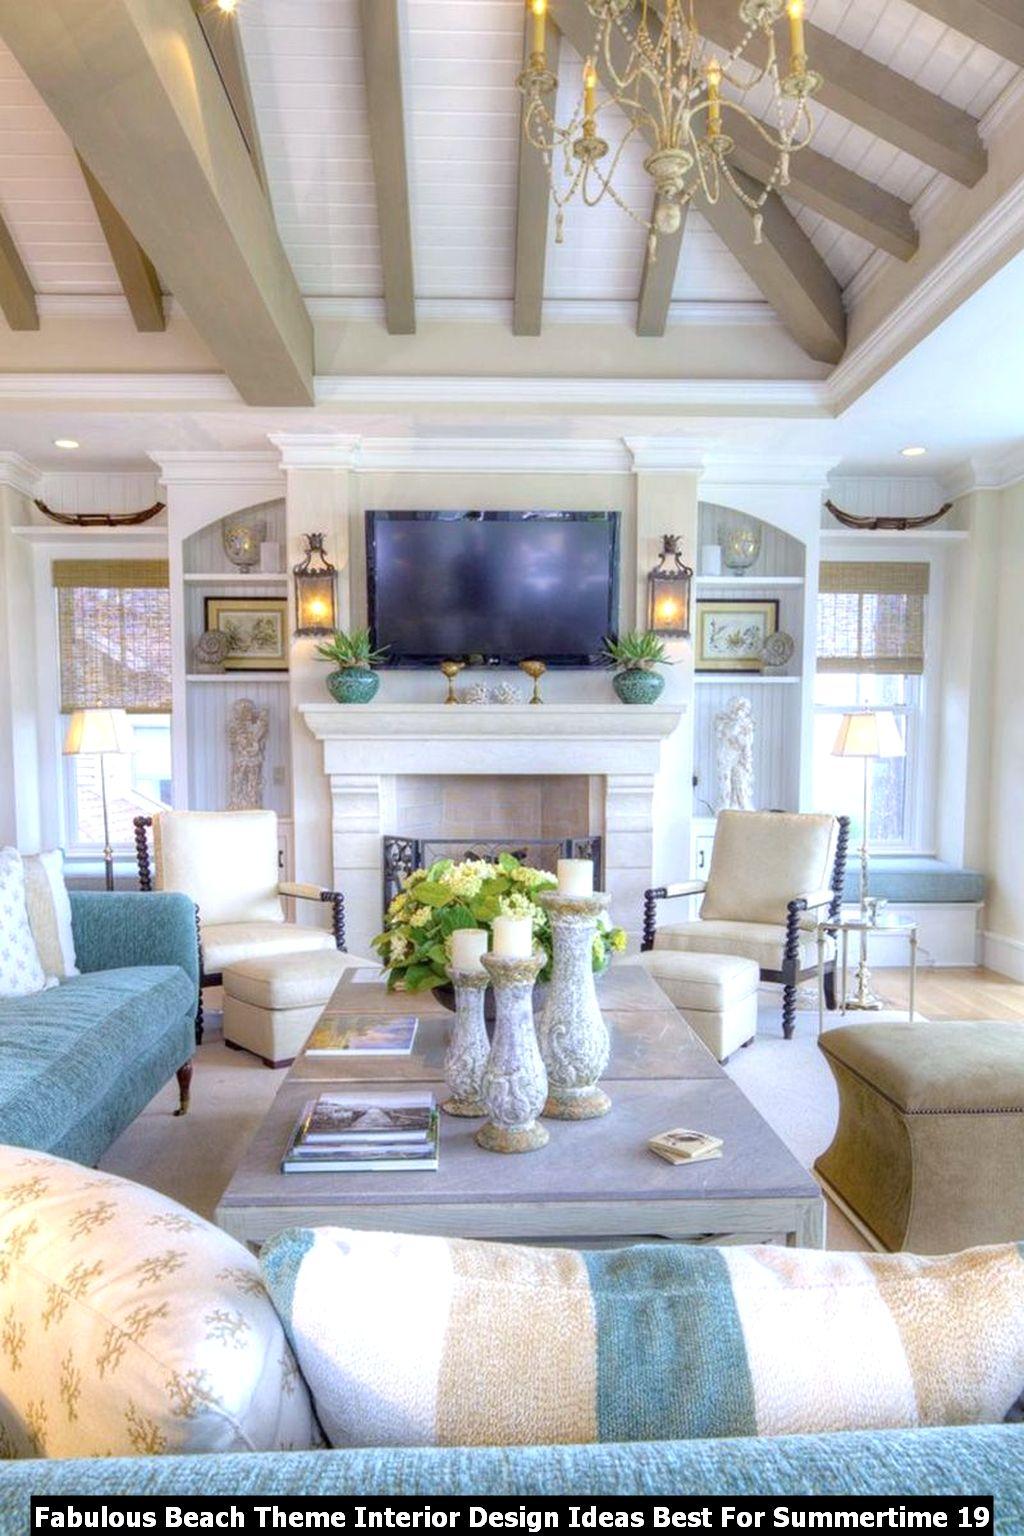 Fabulous Beach Theme Interior Design Ideas Best For Summertime 19